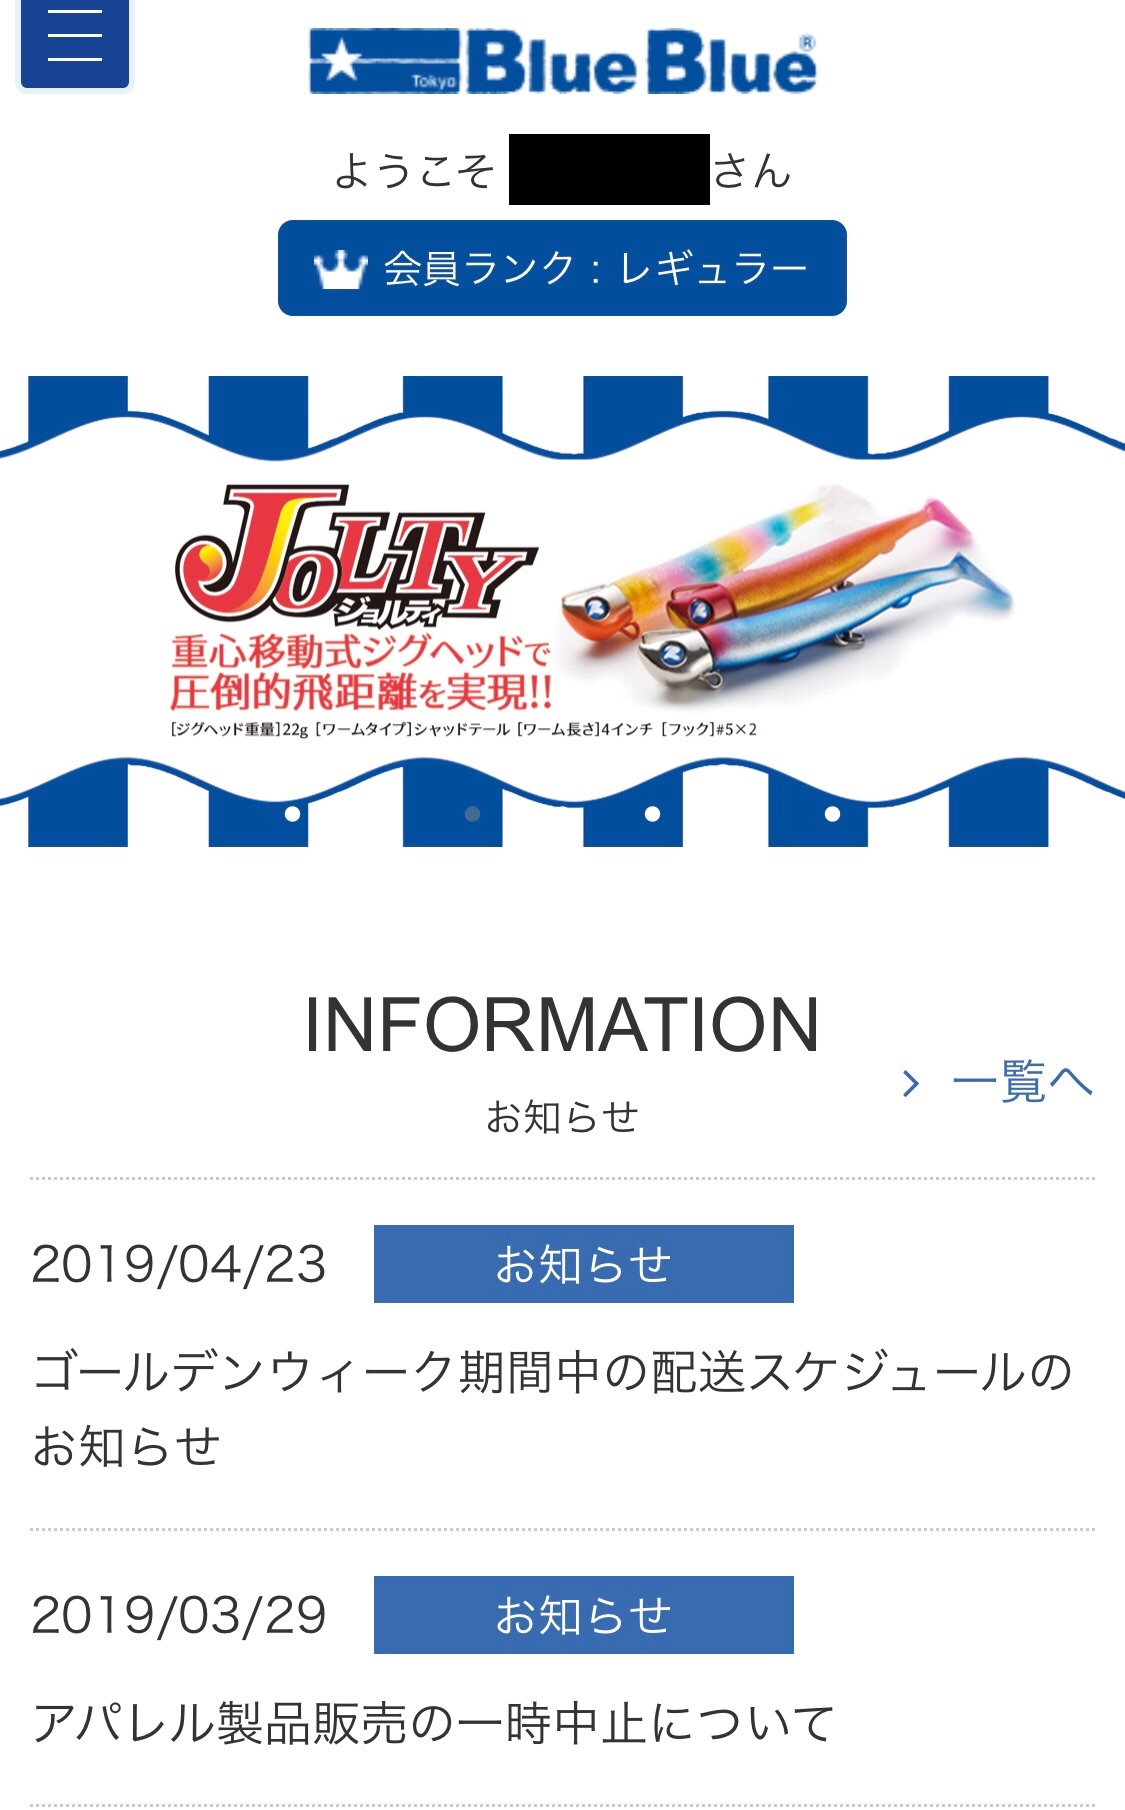 f:id:kuribox:20190425054327j:image